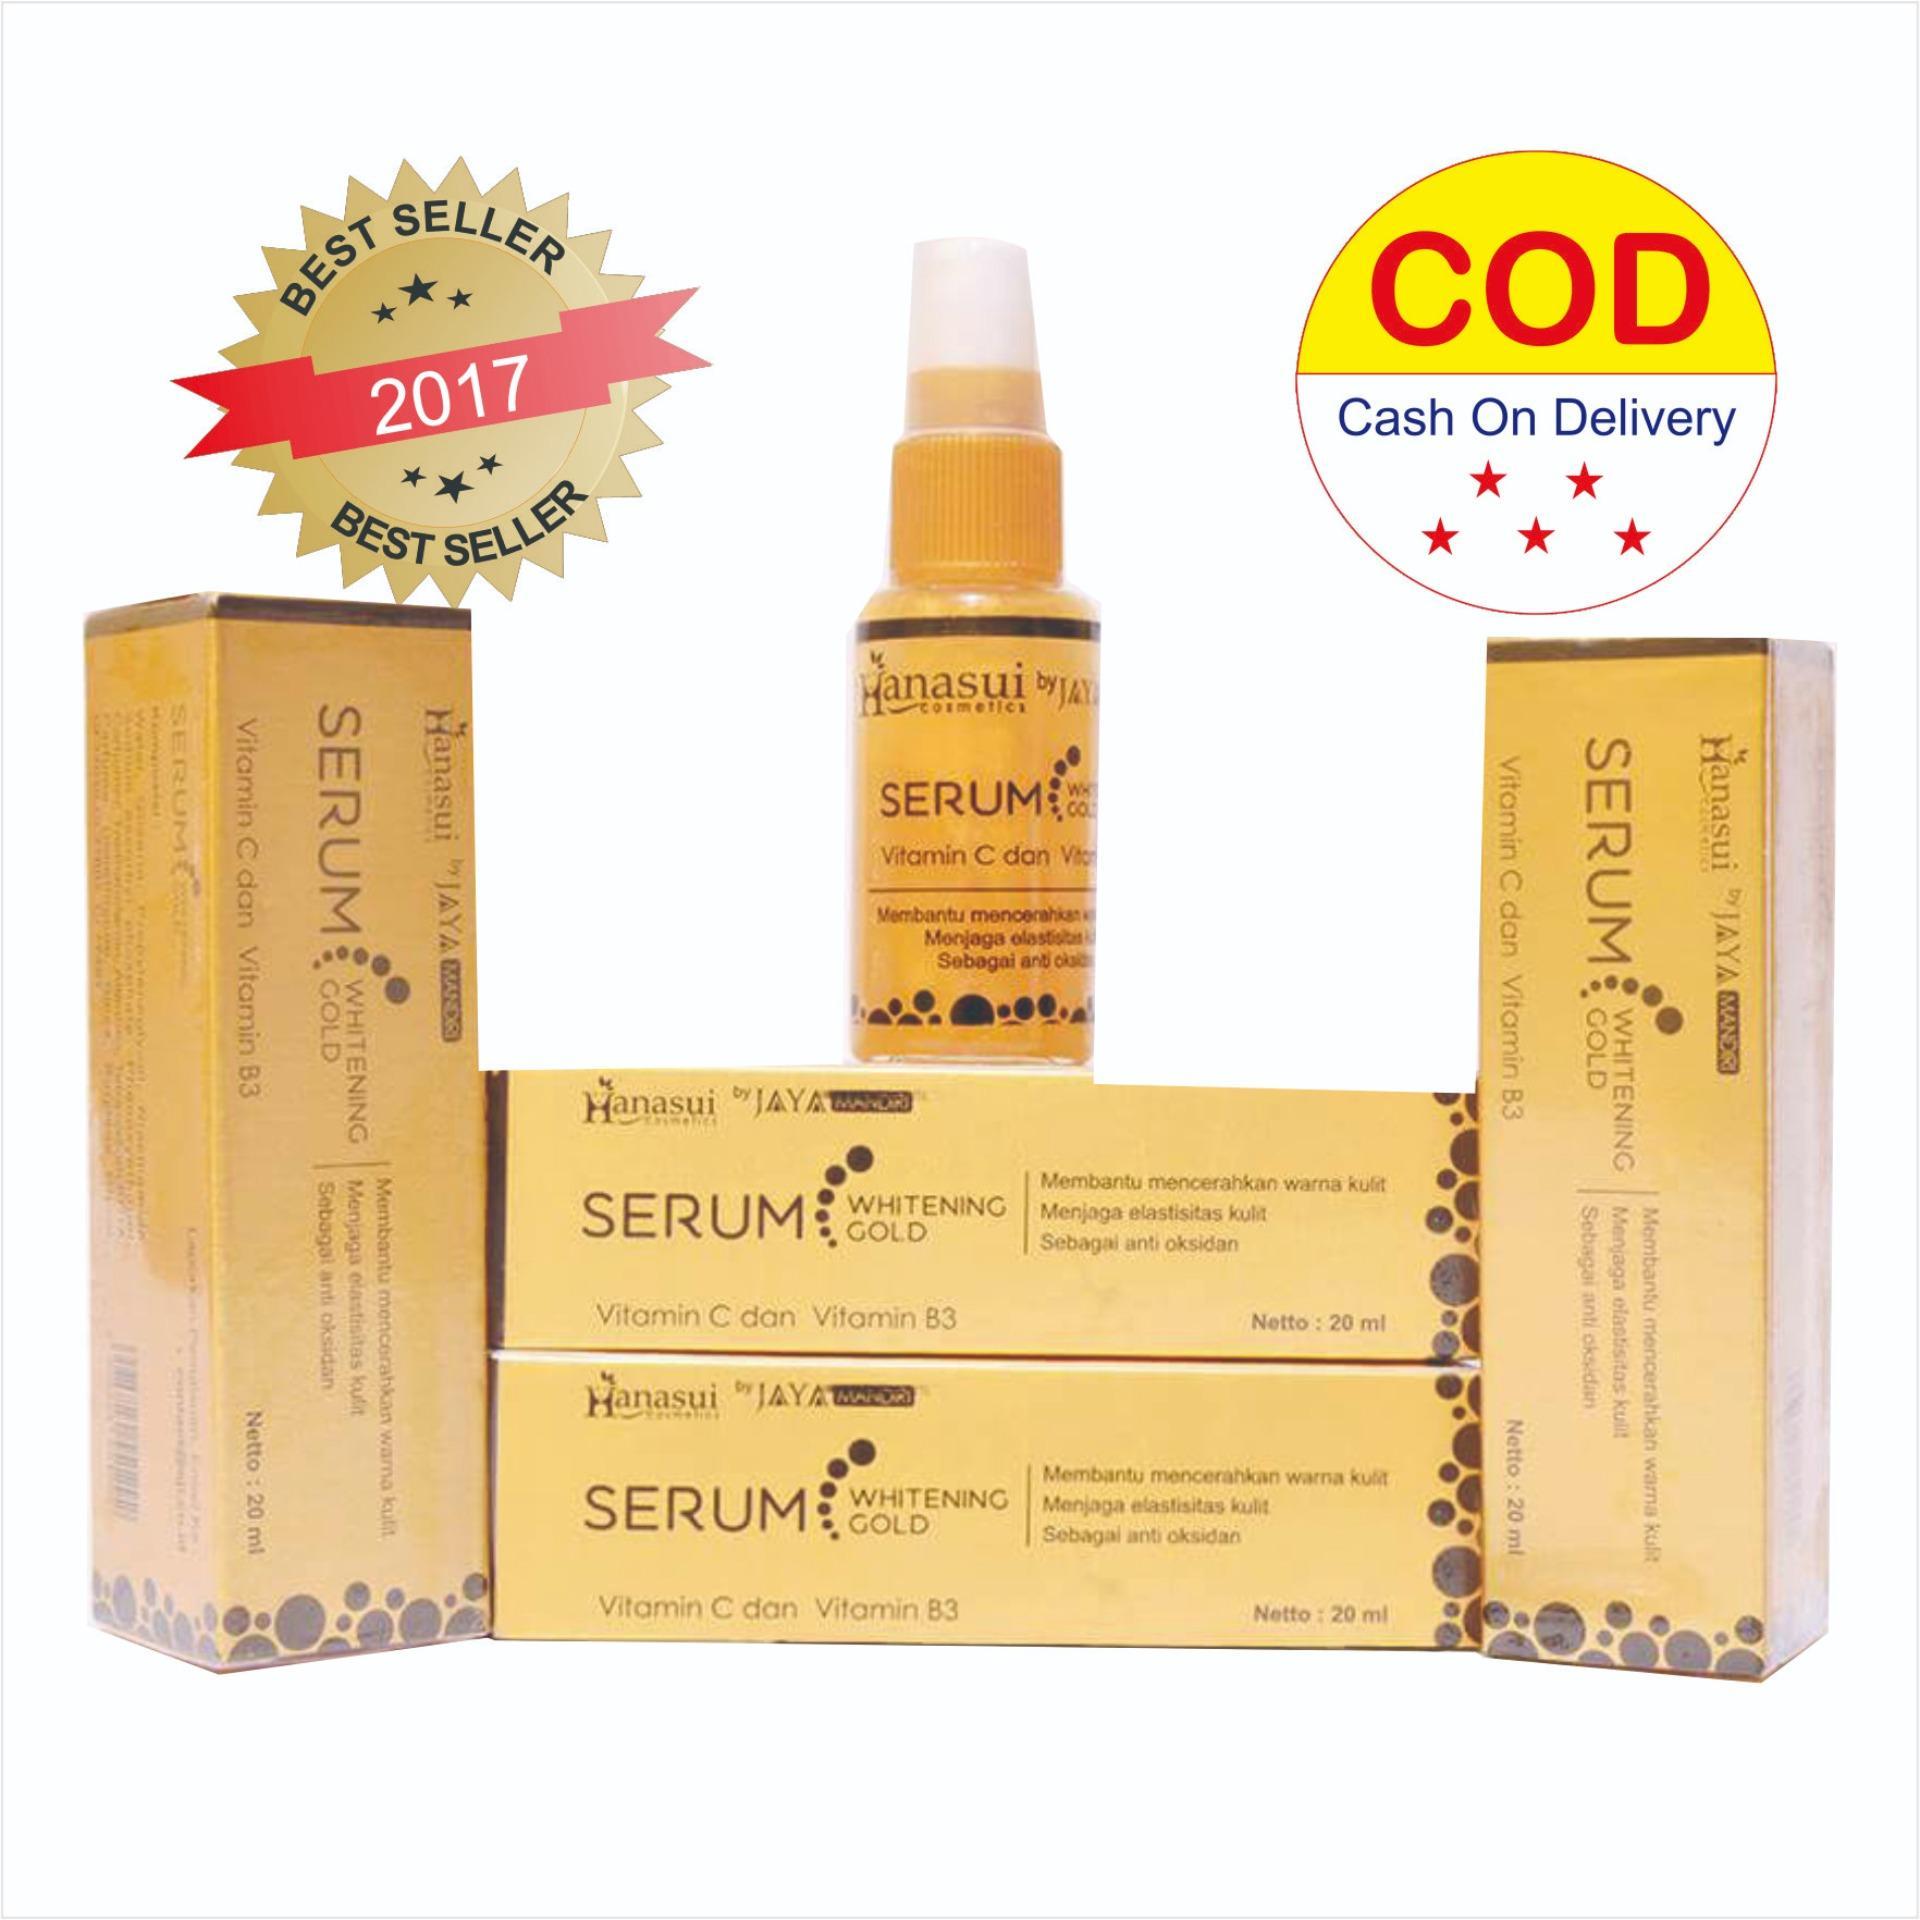 Jual Serum Essence Wajah Hanasui Gold Bpom Original Whitening 20 Ml